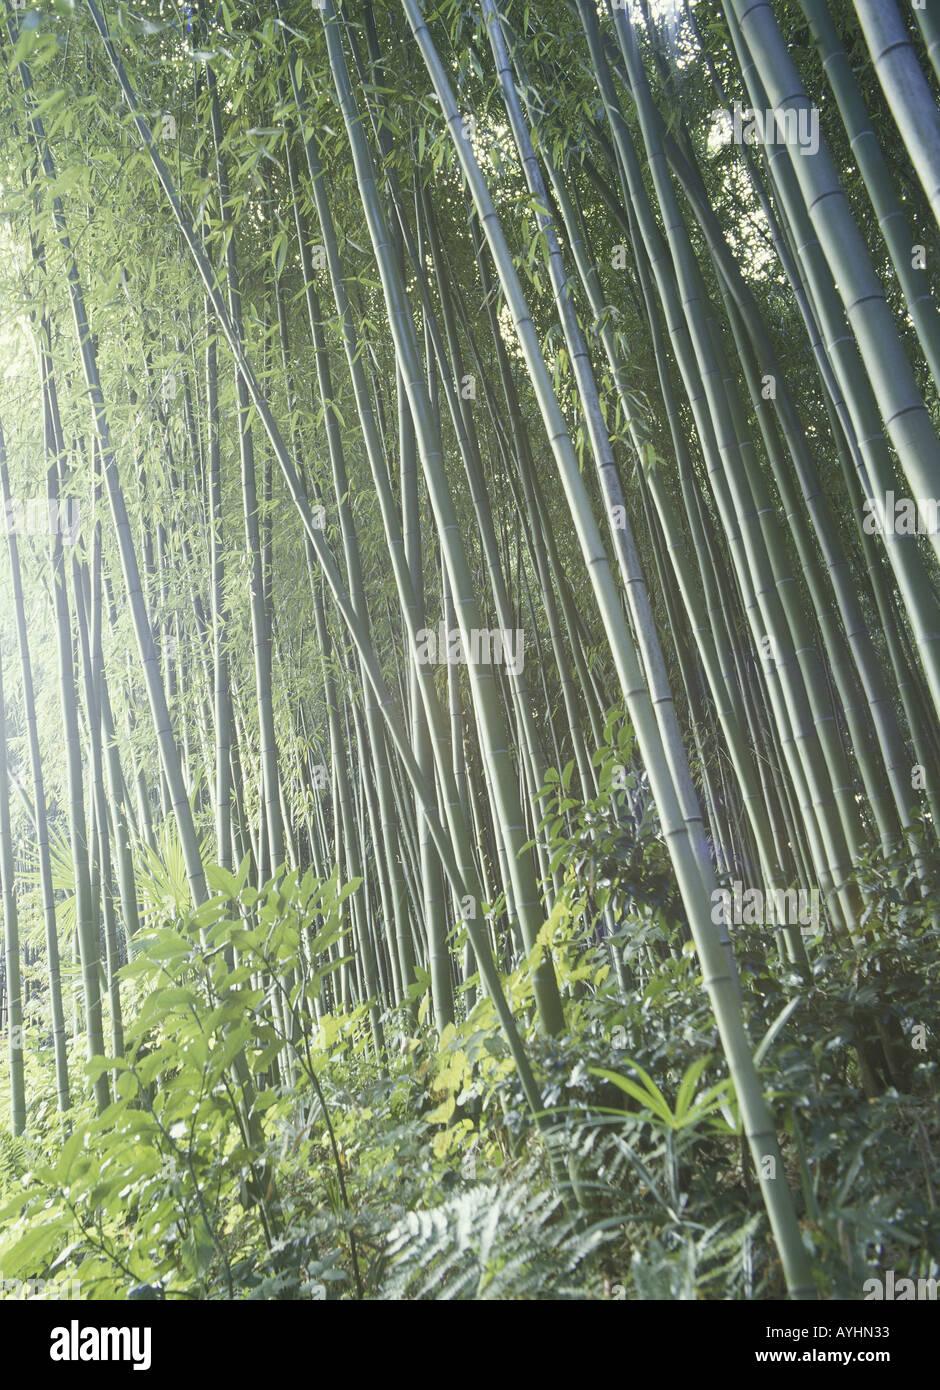 Bambuswald Stock Photo 5587250 Alamy